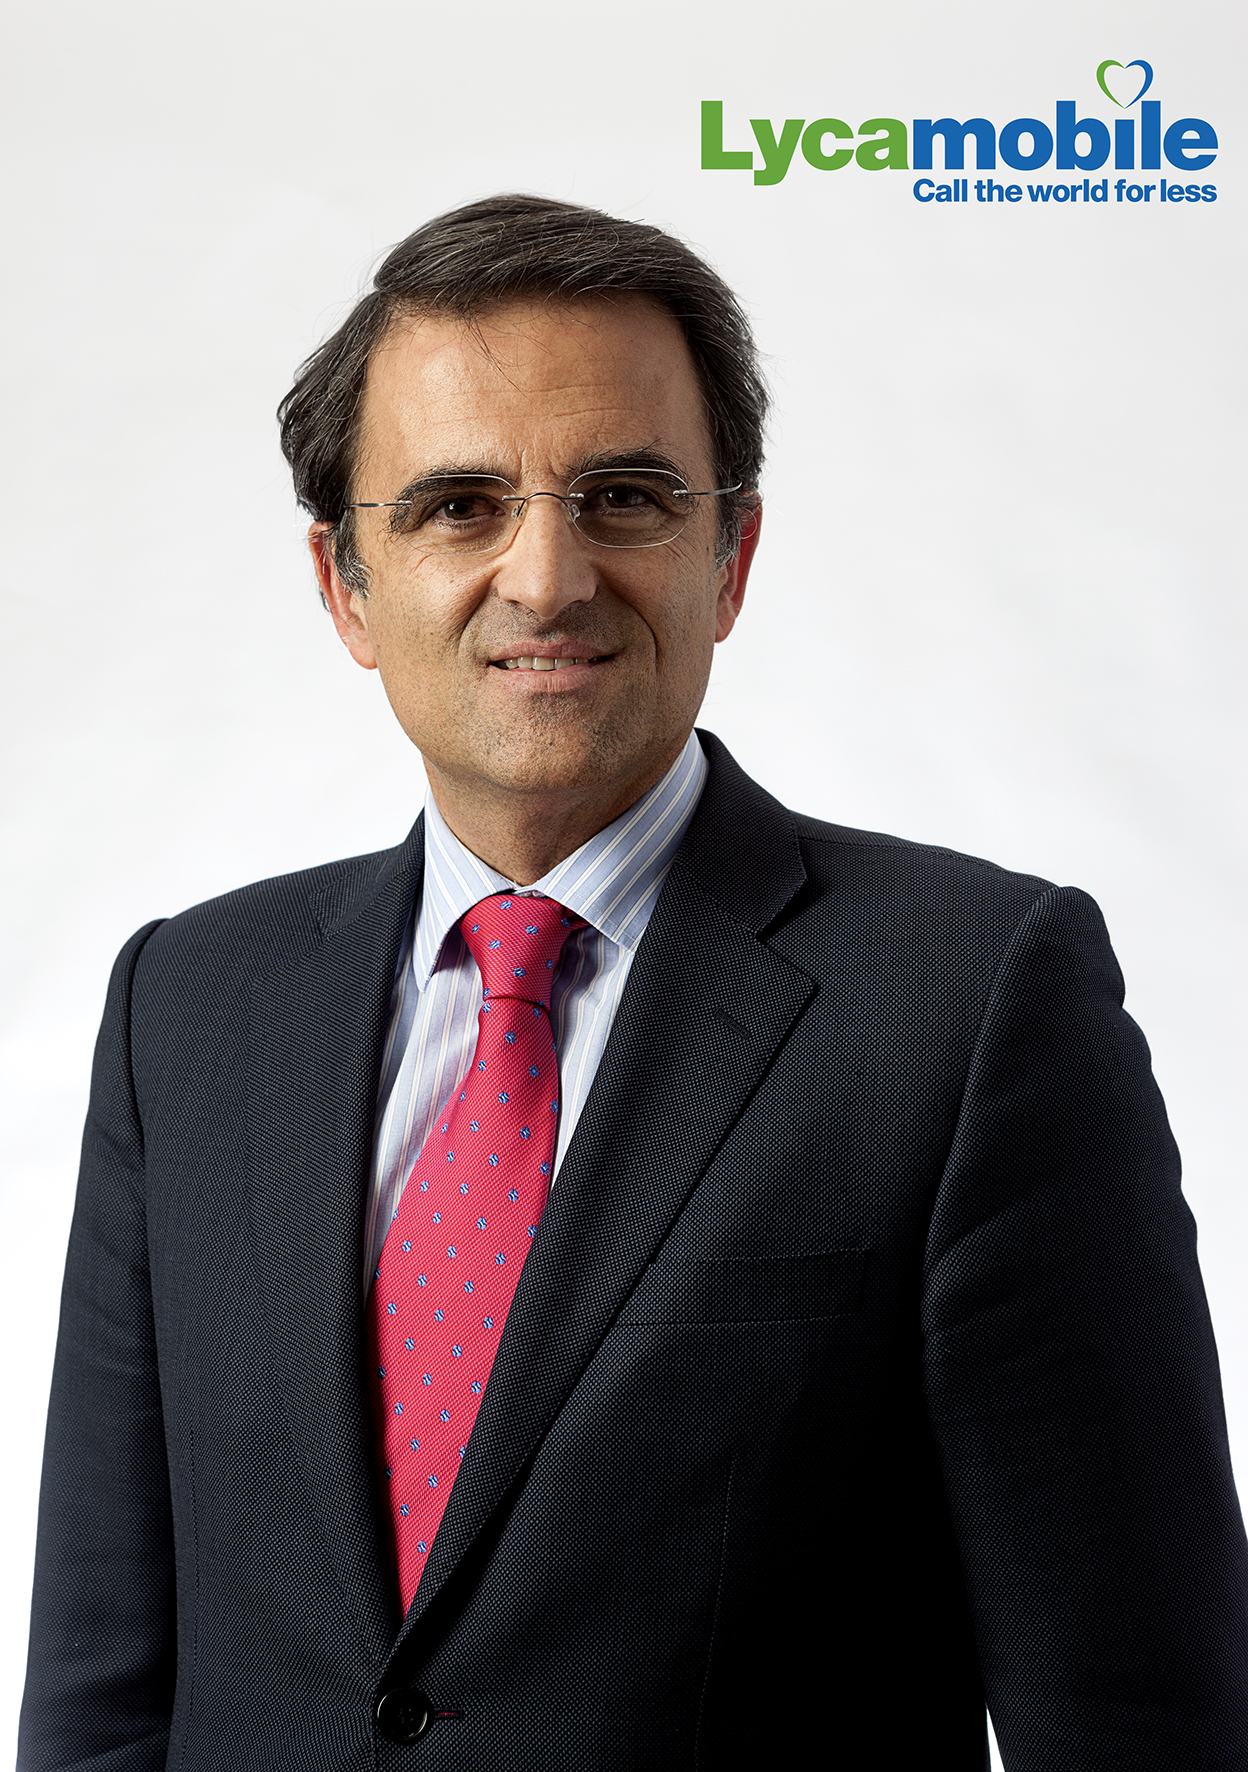 Rafael_lyca